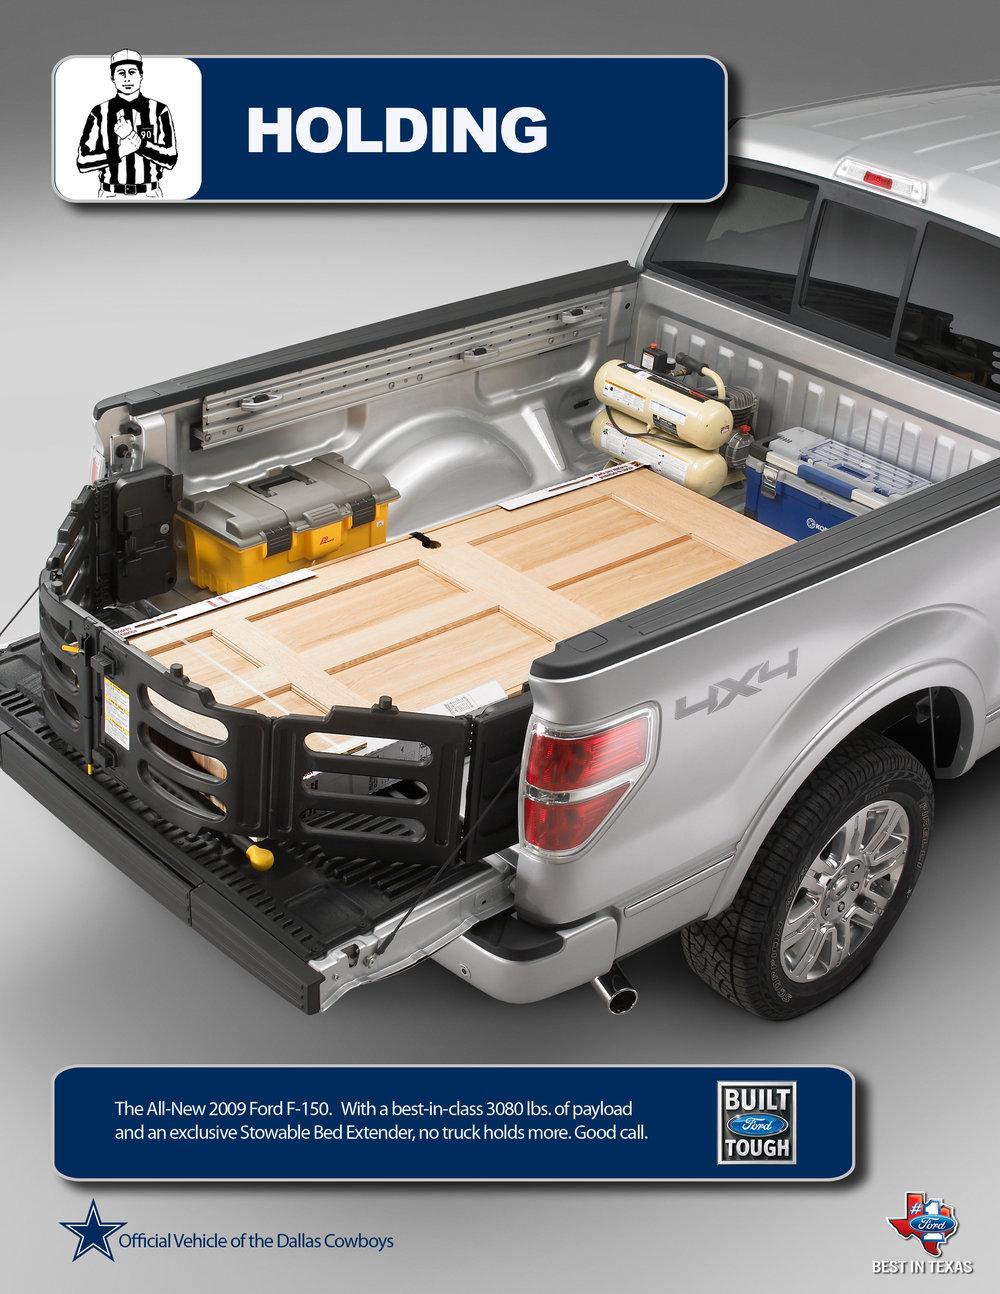 Ford F150-Holding.jpg